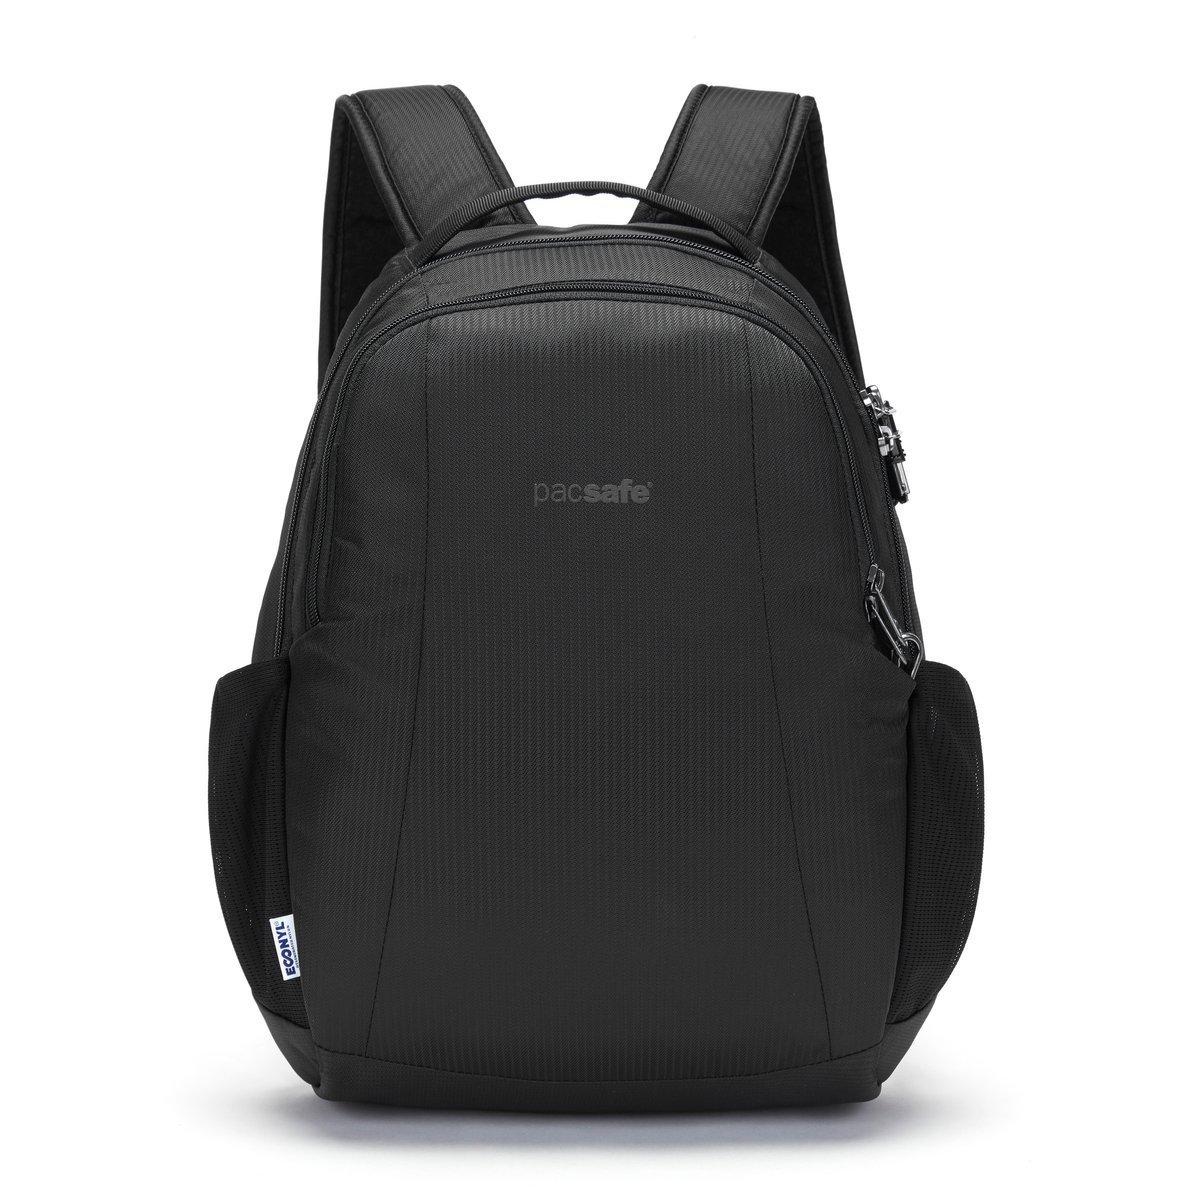 Plecak Pacsafe Metrosafe LS350 - Econyl Black